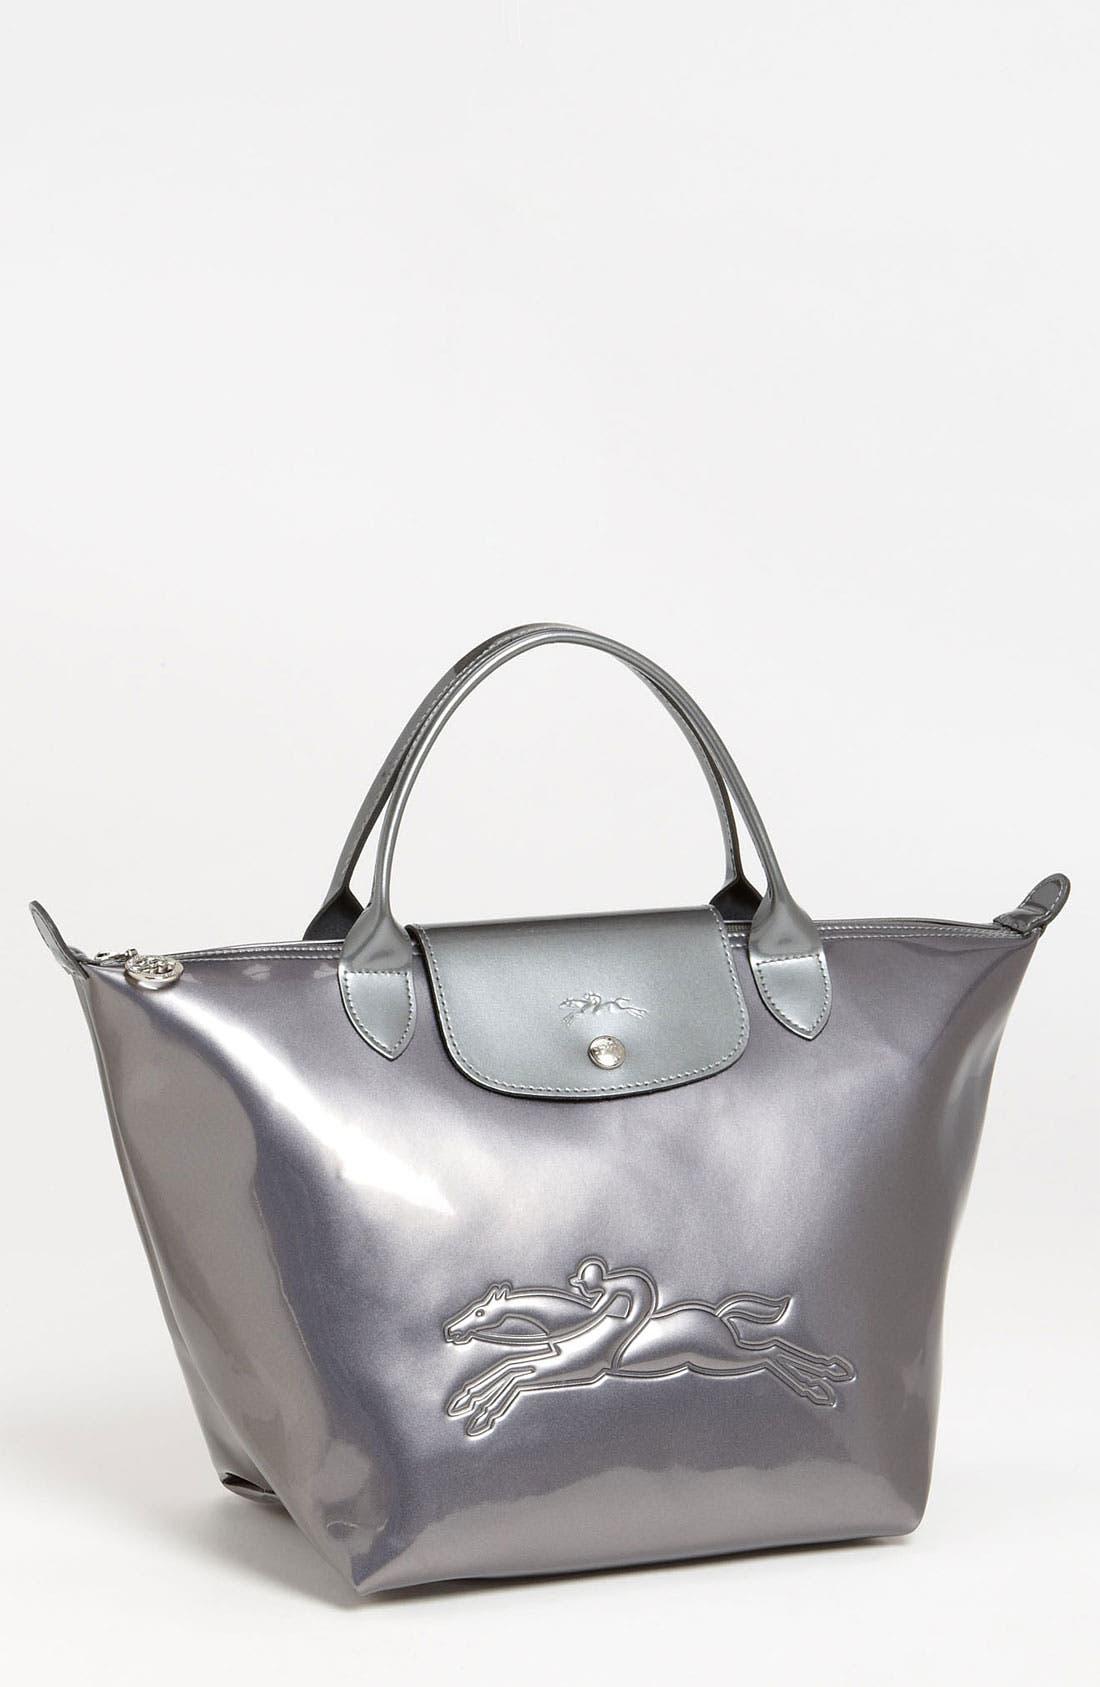 Main Image - Longchamp 'Victoire' Small Tote